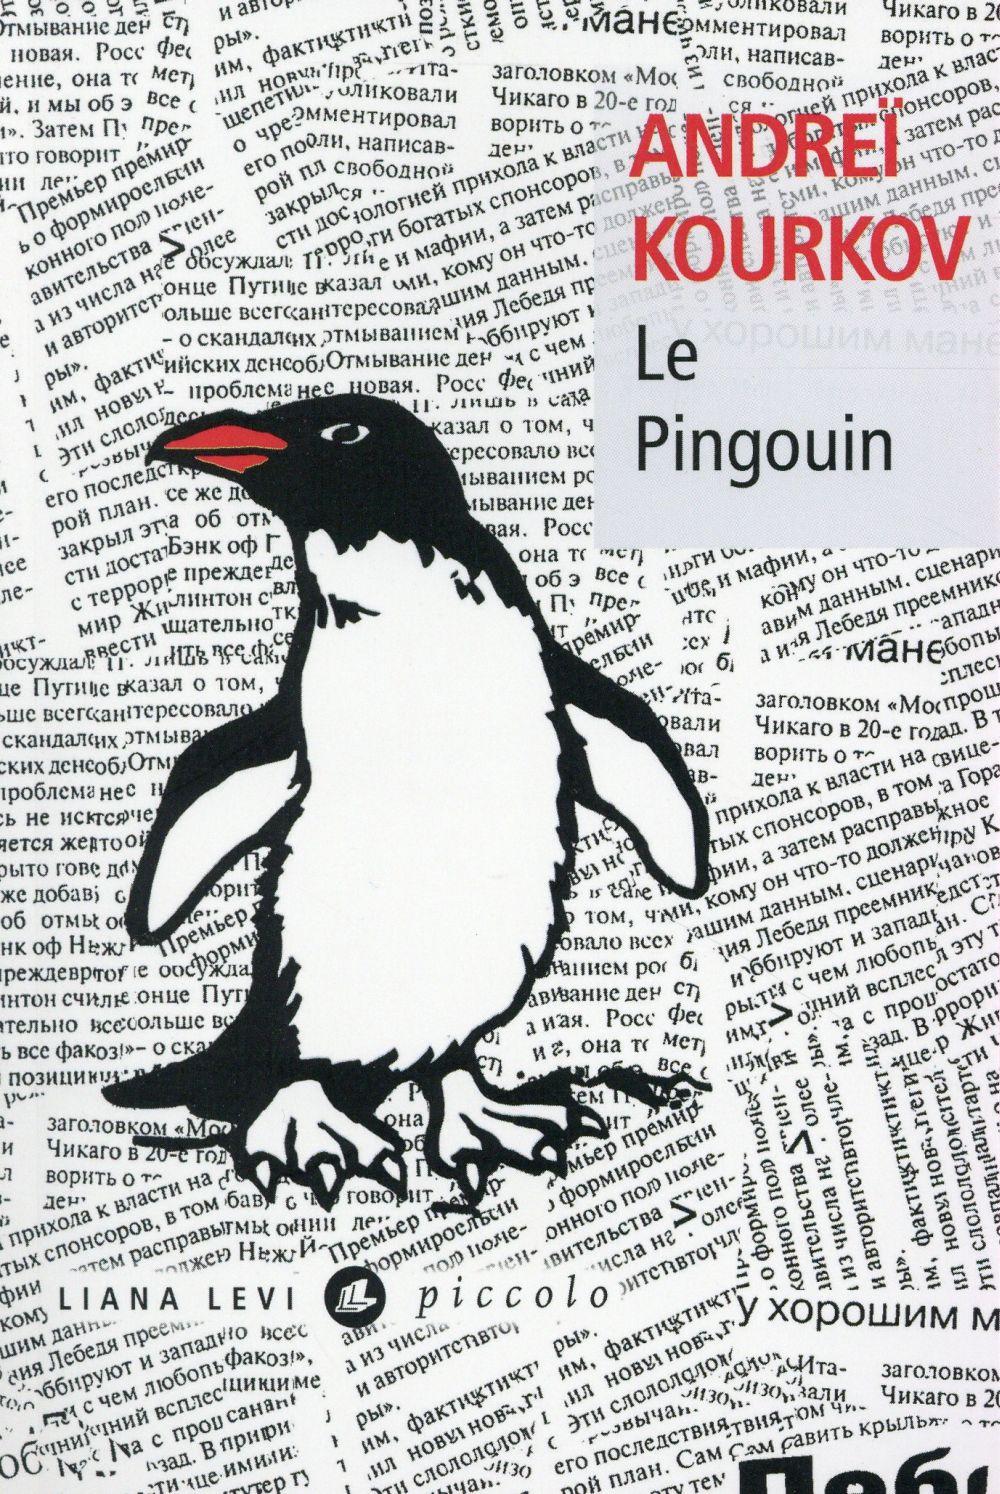 LE PINGOUIN Kourkov Andreï Liana Levi